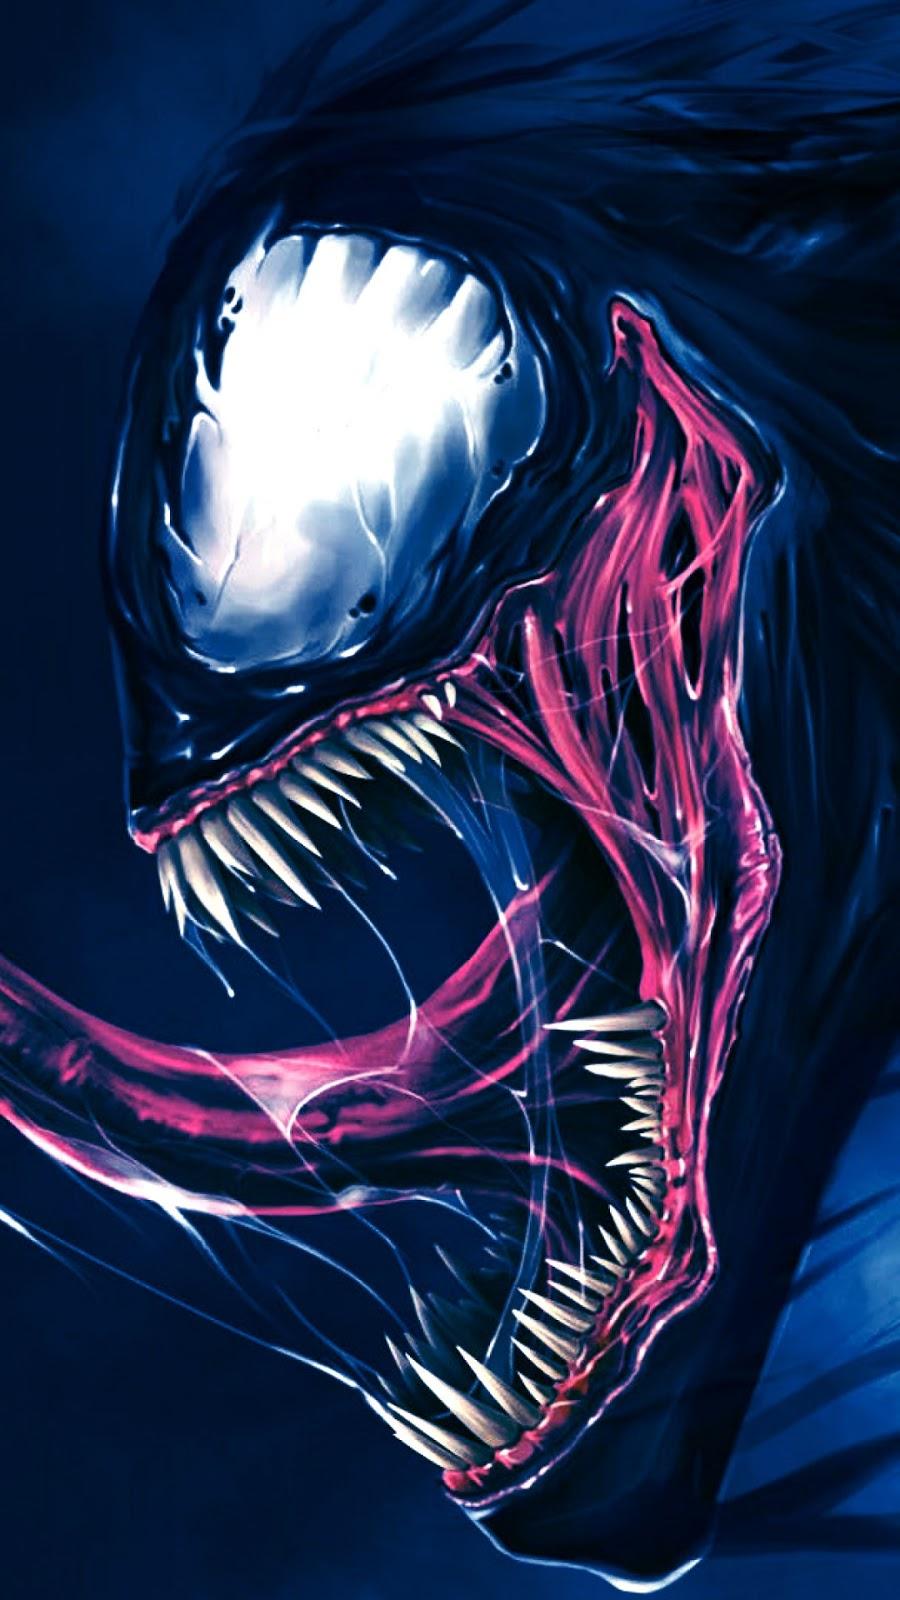 Papel de parede grátis Venom Fan Arte para PC, Notebook, iPhone, Android e Tablet.